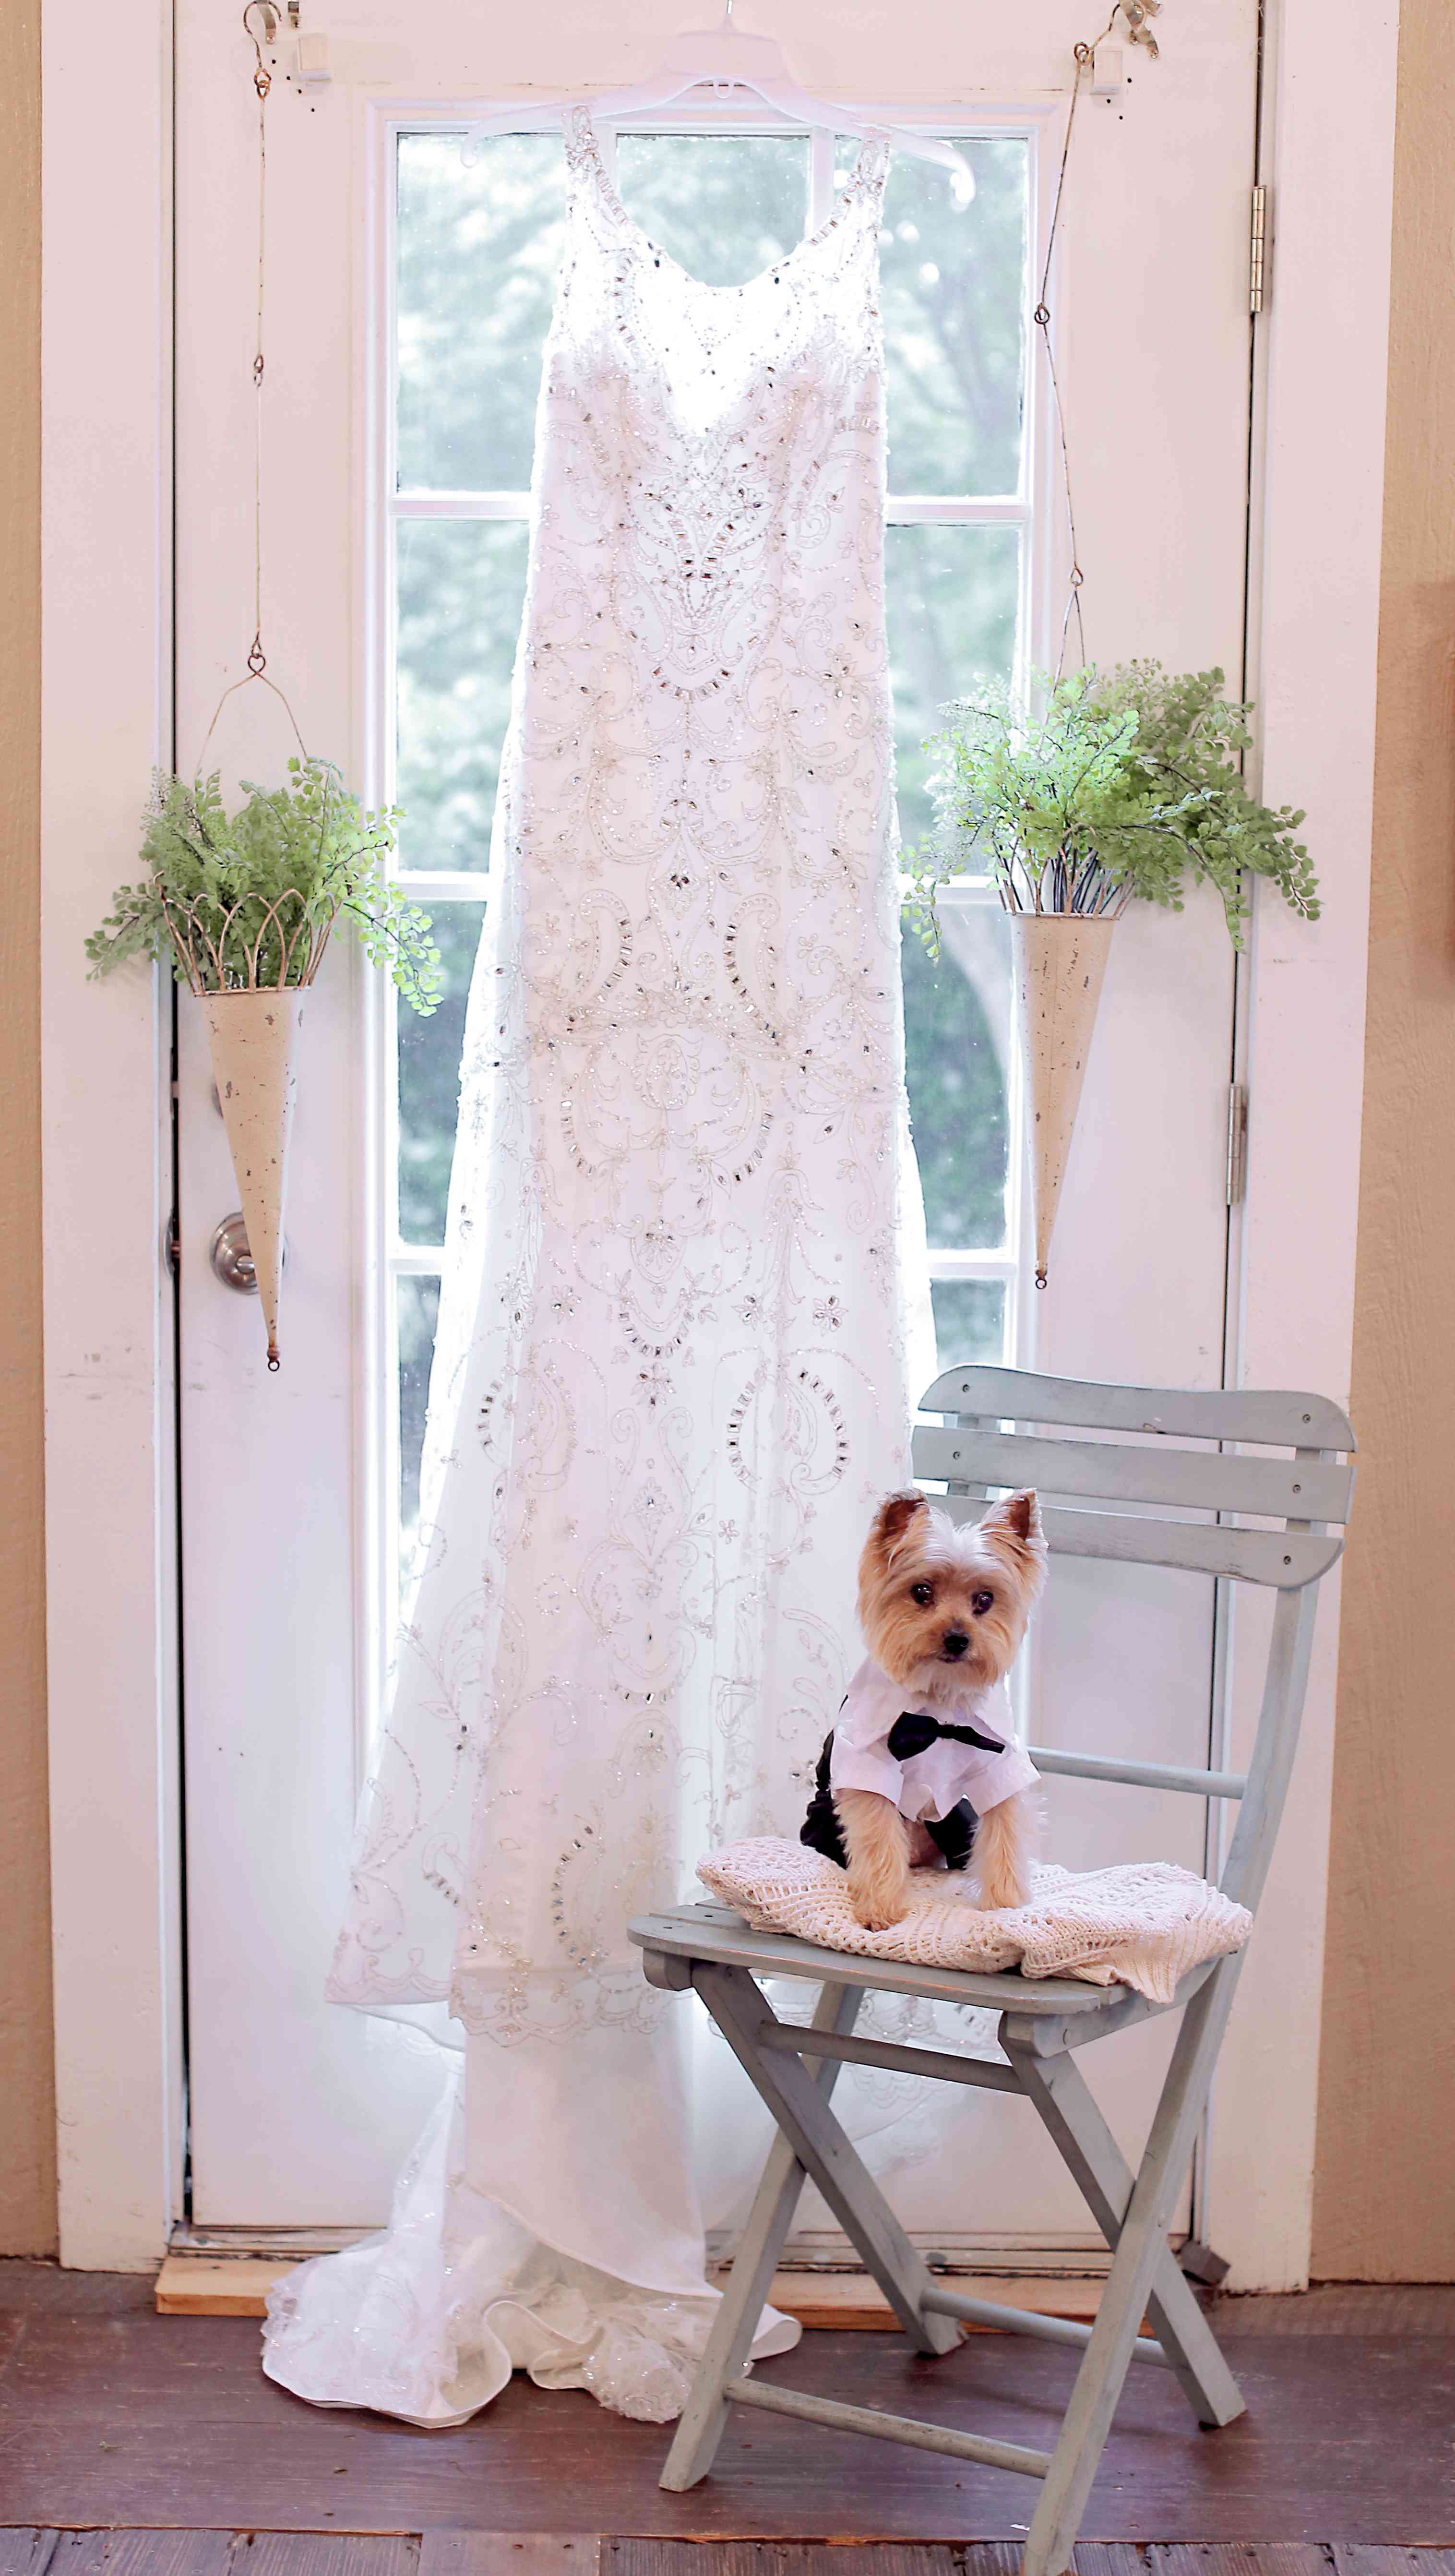 Dog posing with dress